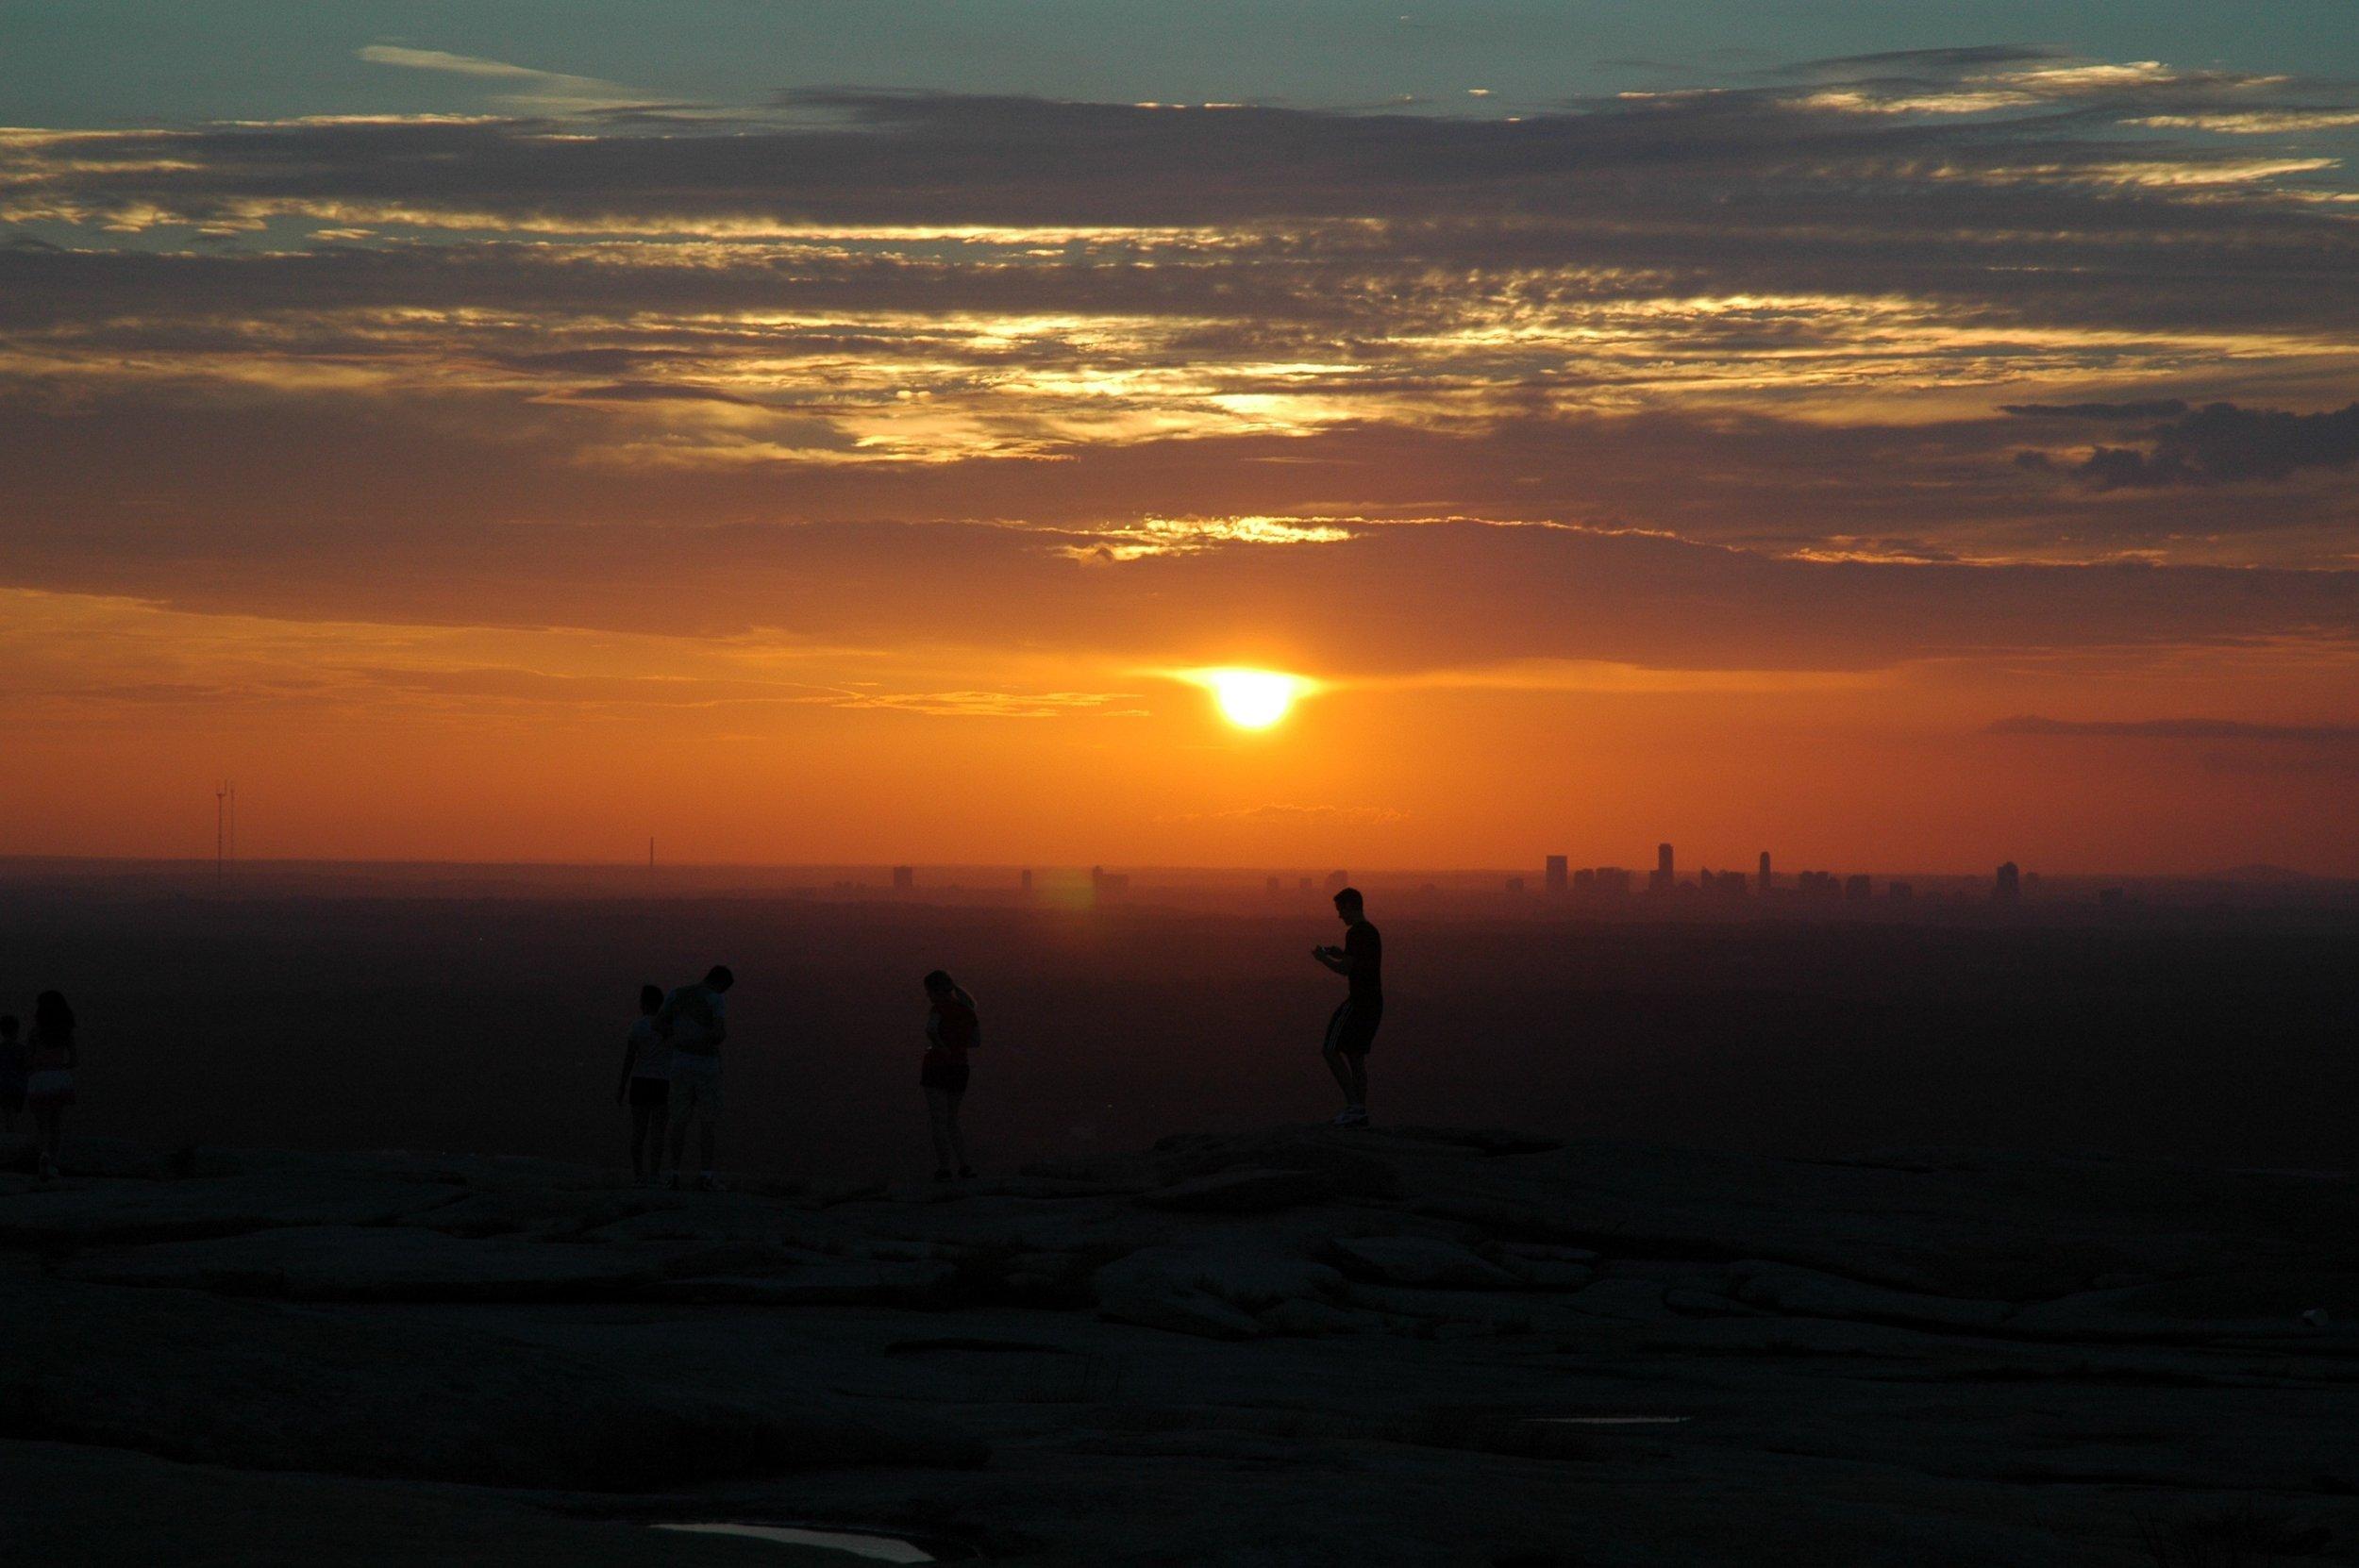 sunset-207221.jpg